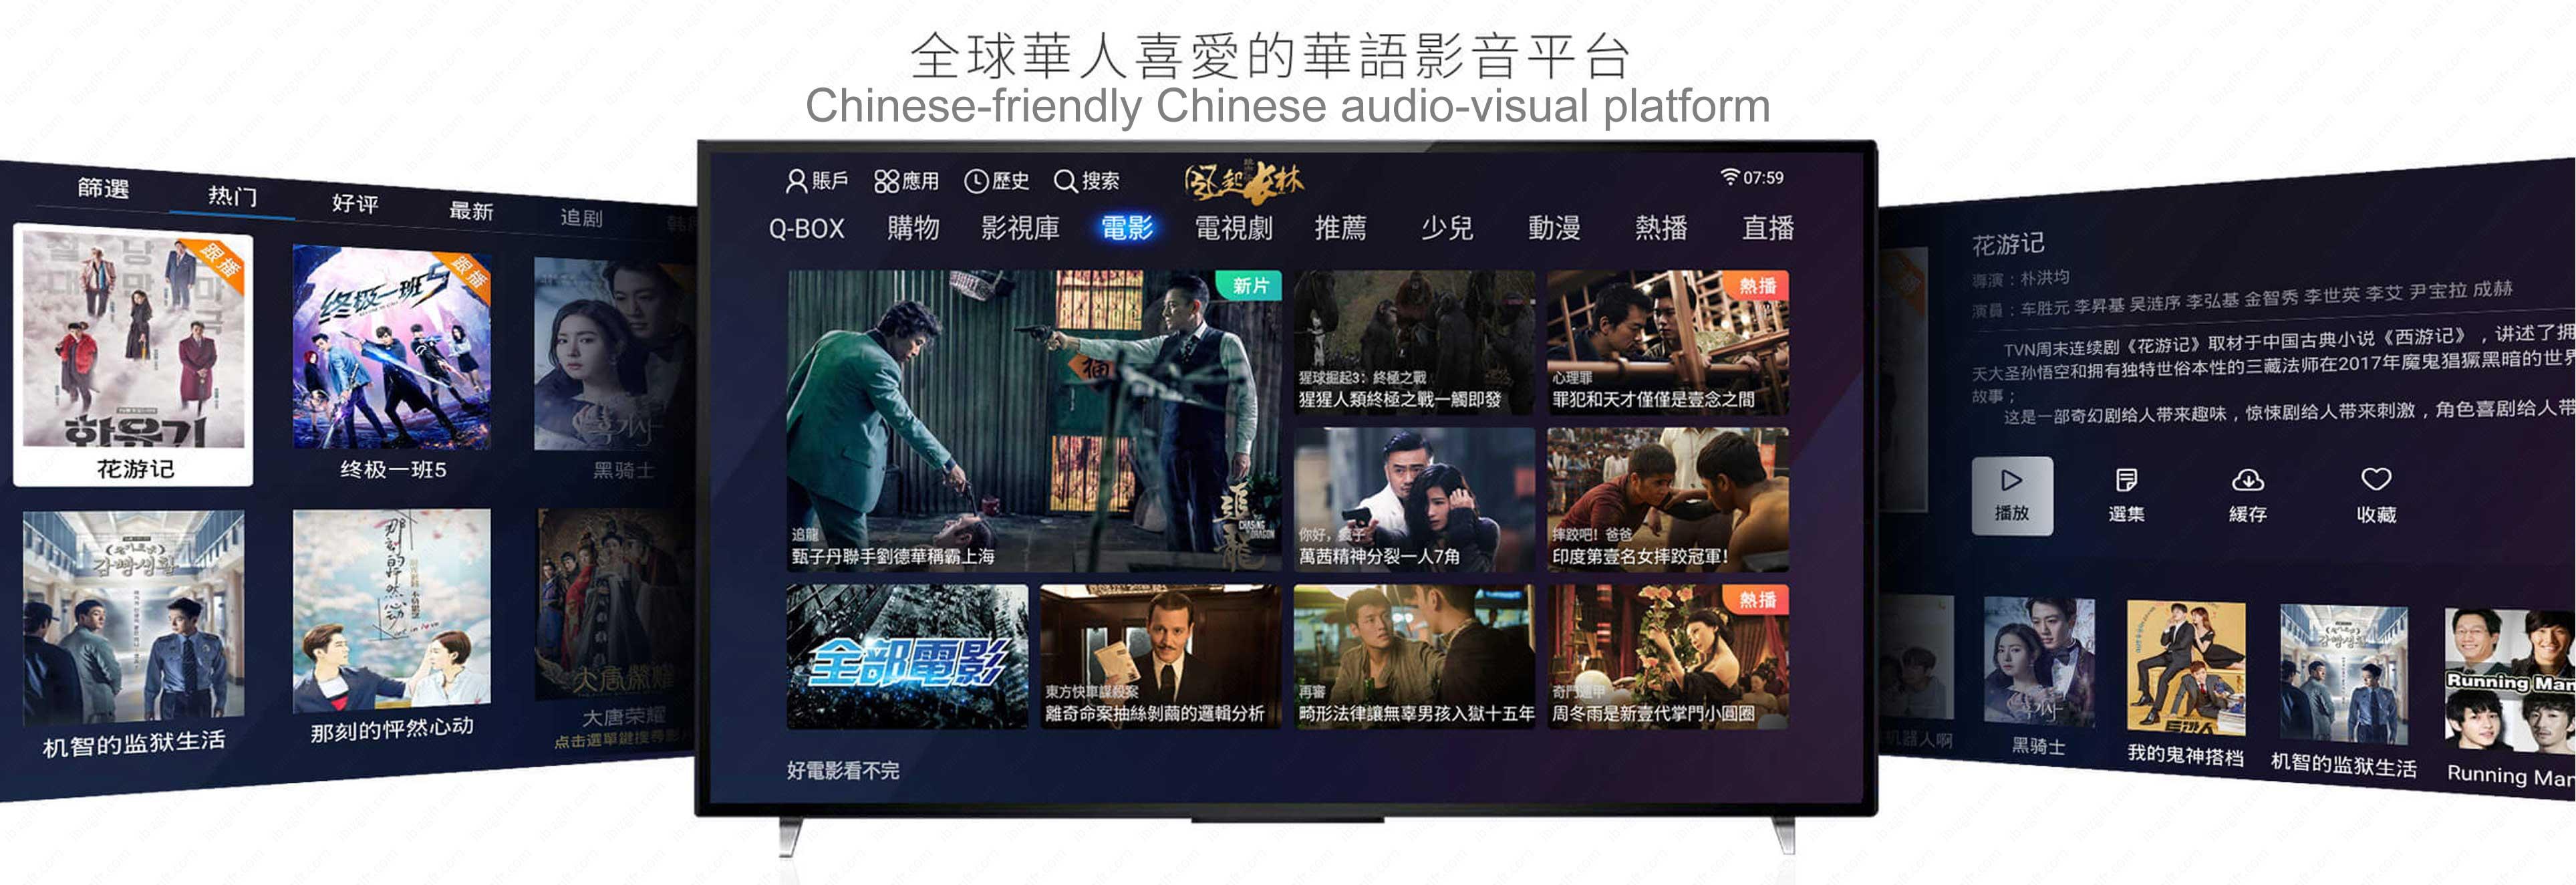 QianXun QBox5, qbox5, tvbox, set-top box